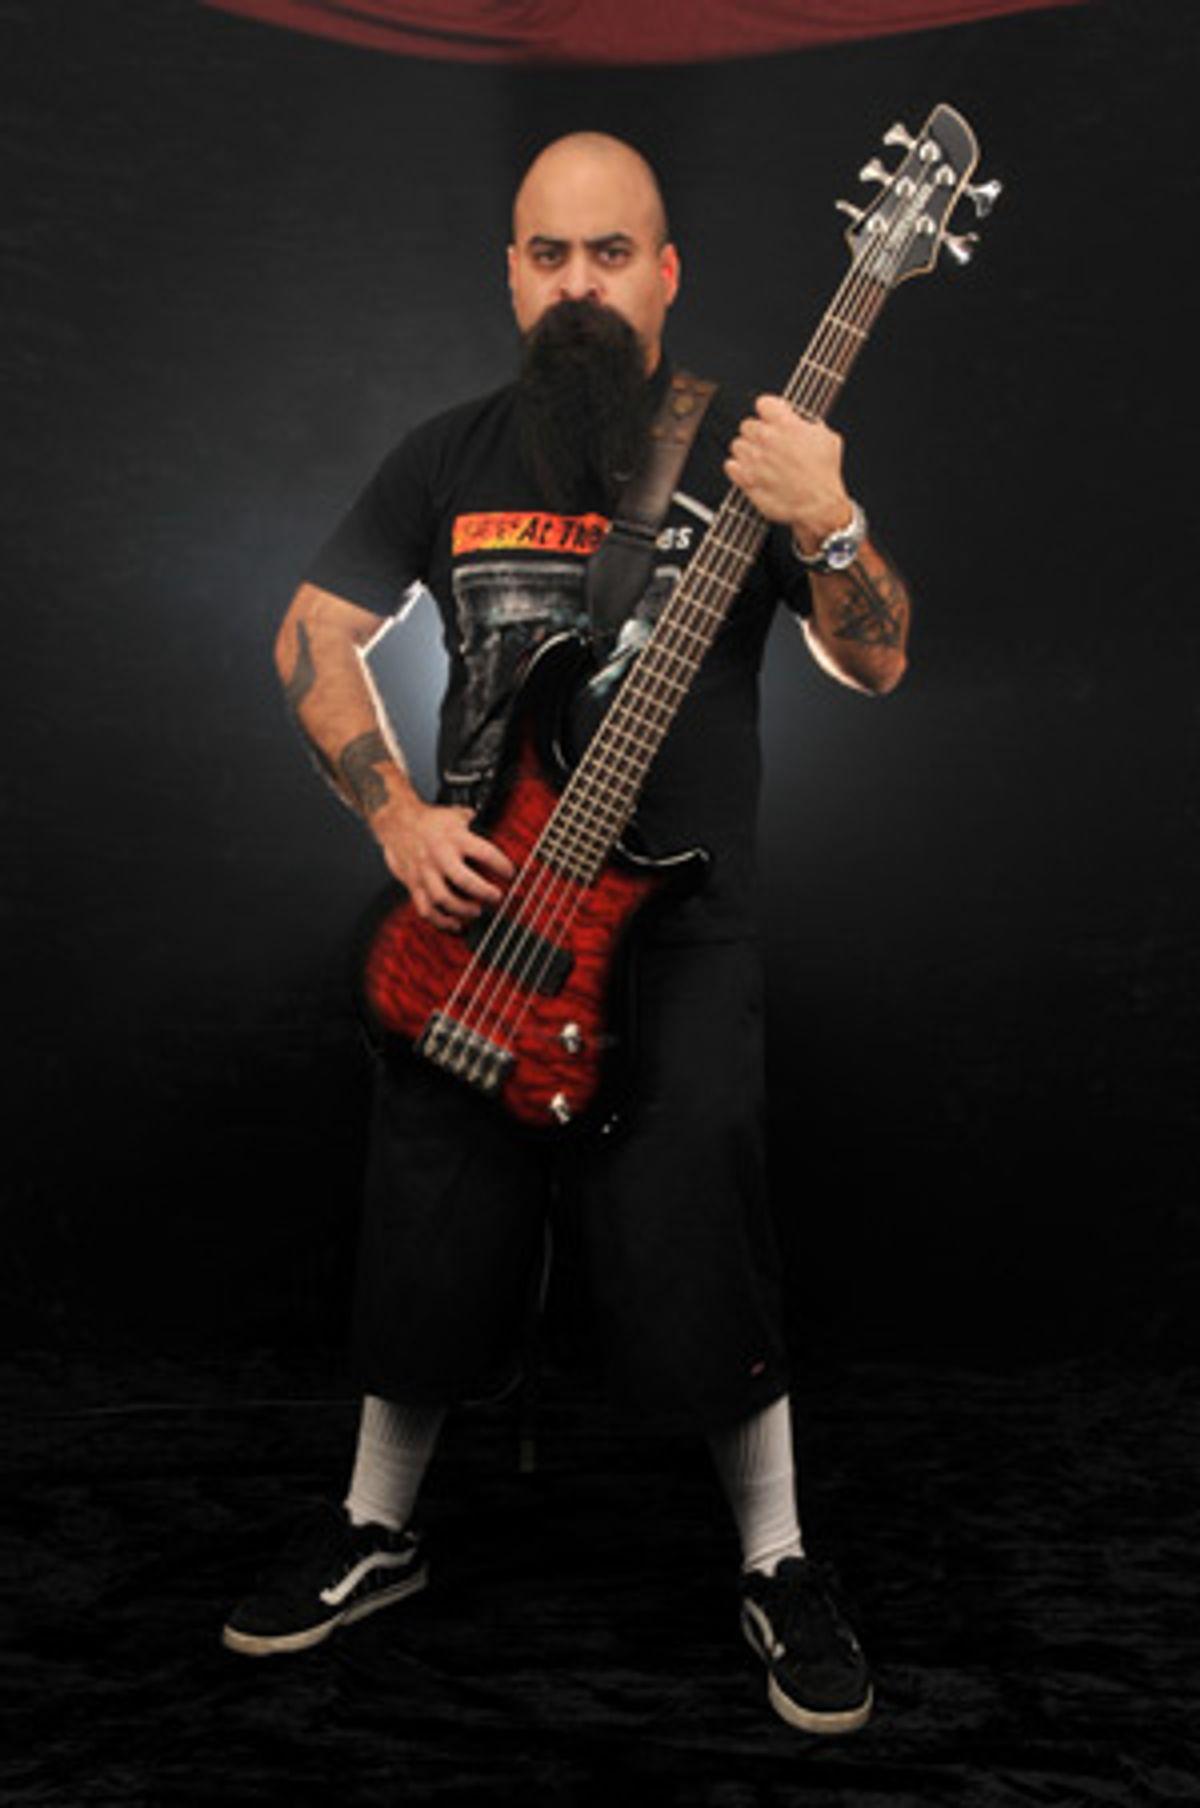 Fernandes Announces Tony Campos Signature Tremor 5 Bass